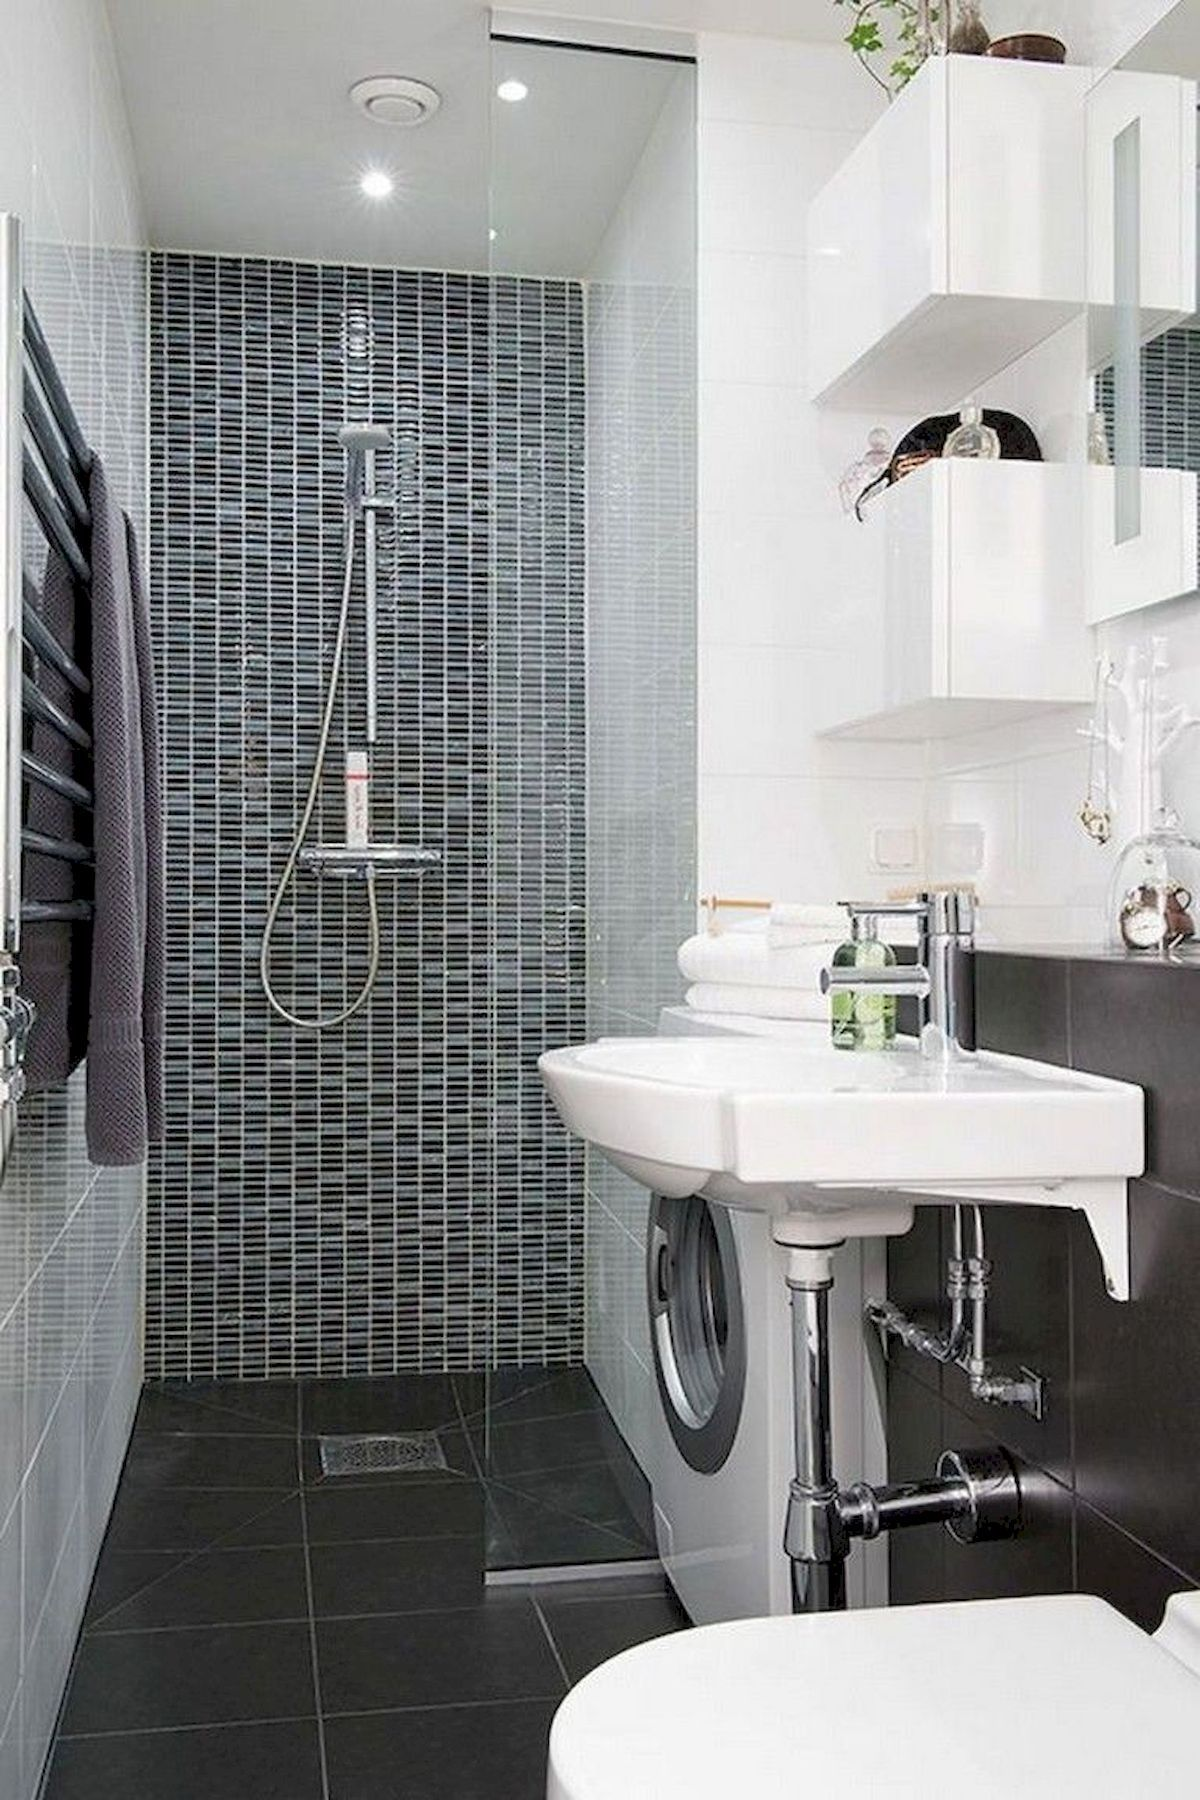 30 Stunning Small Bathroom Ideas On A Budget | Small ...